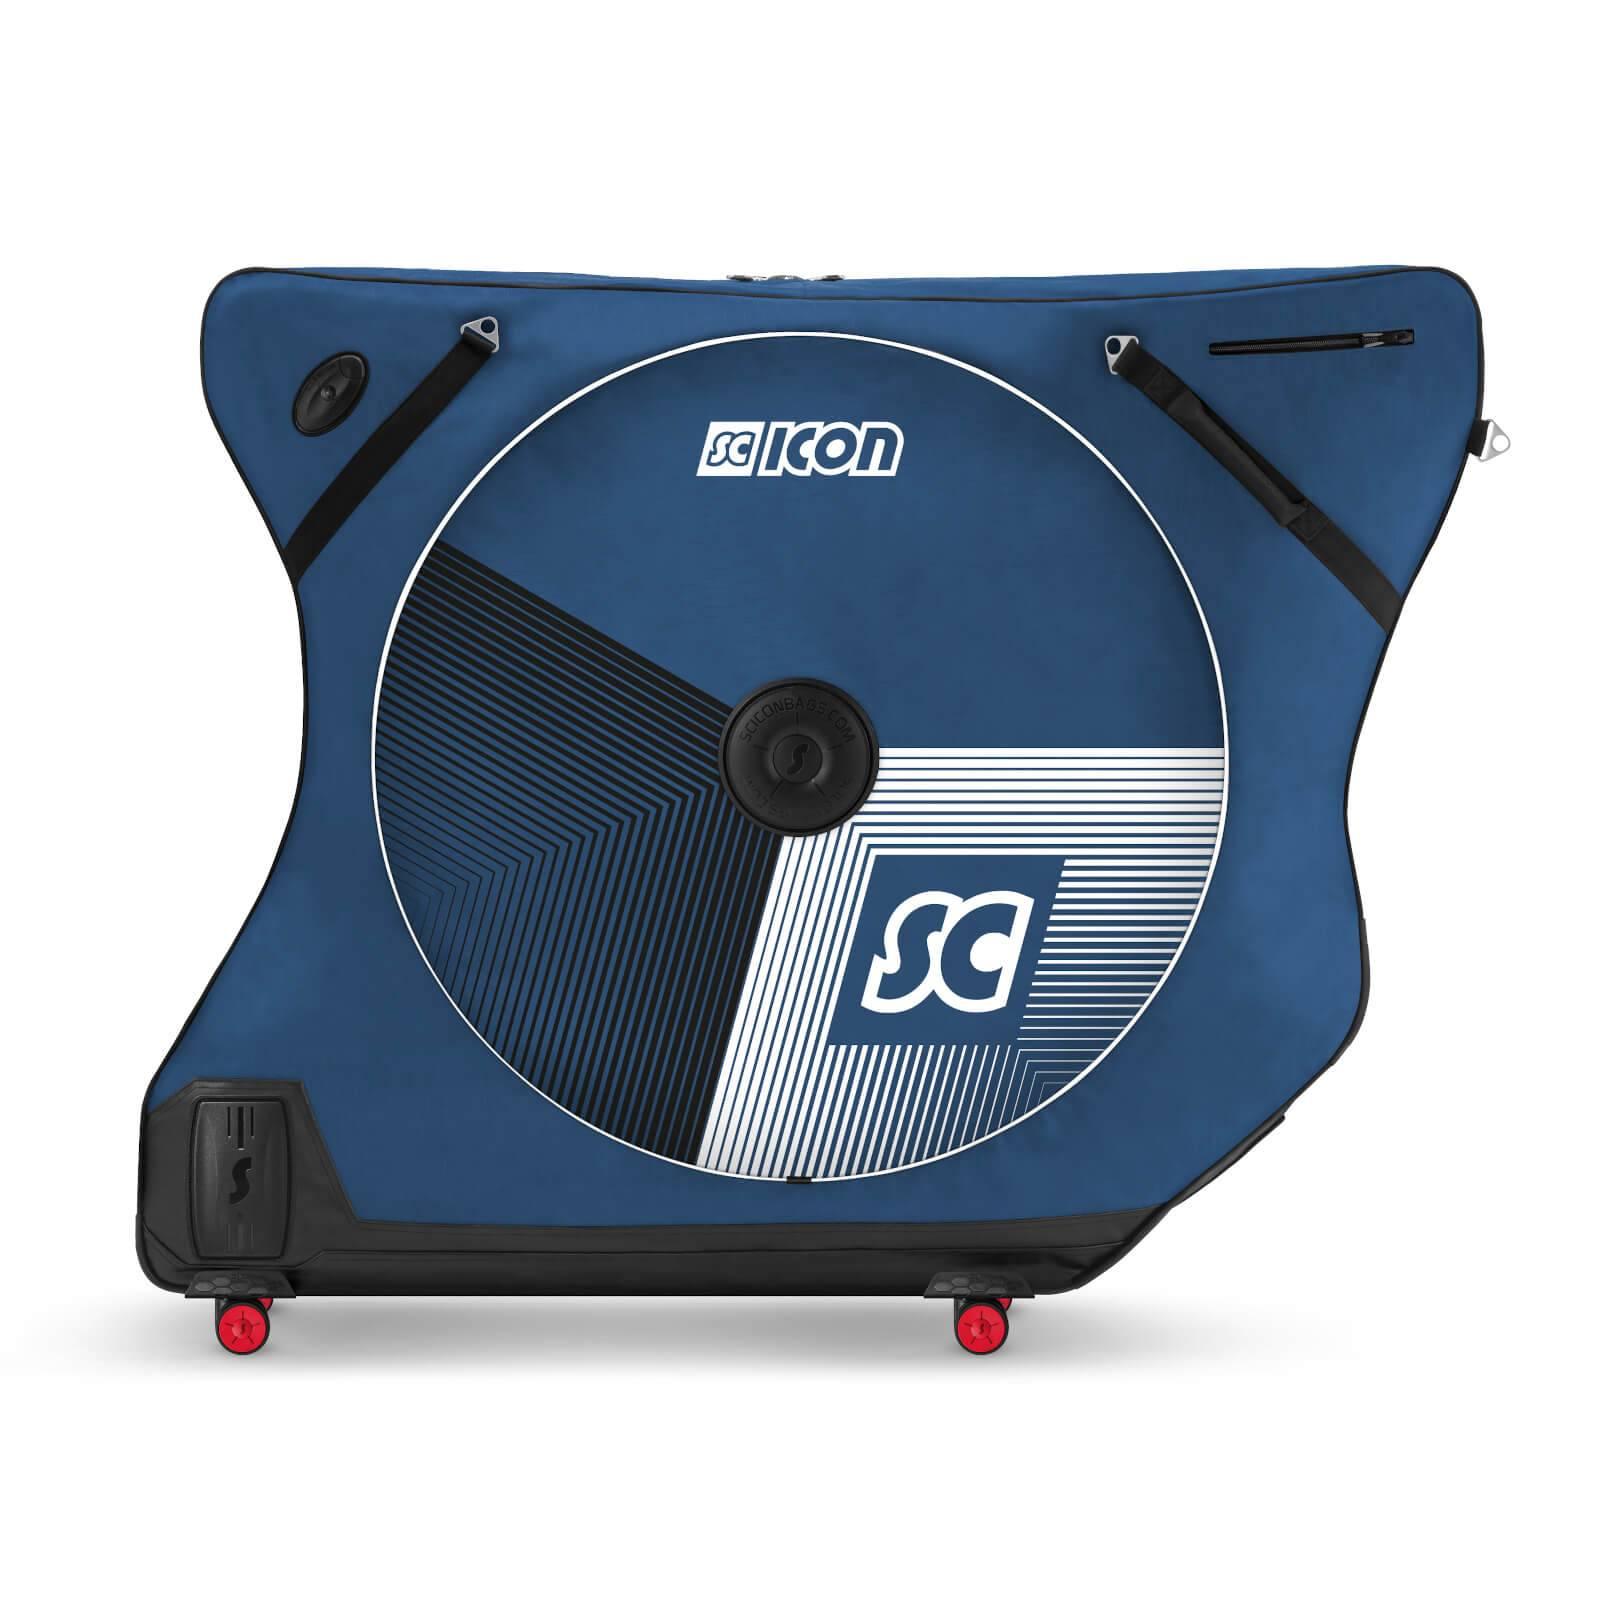 Scicon AeroComfort Road 3.0 TSA Ltd Edition Bike Bag With FREE Passport Wallet & Race Rain Bag - Stelvio Blue;